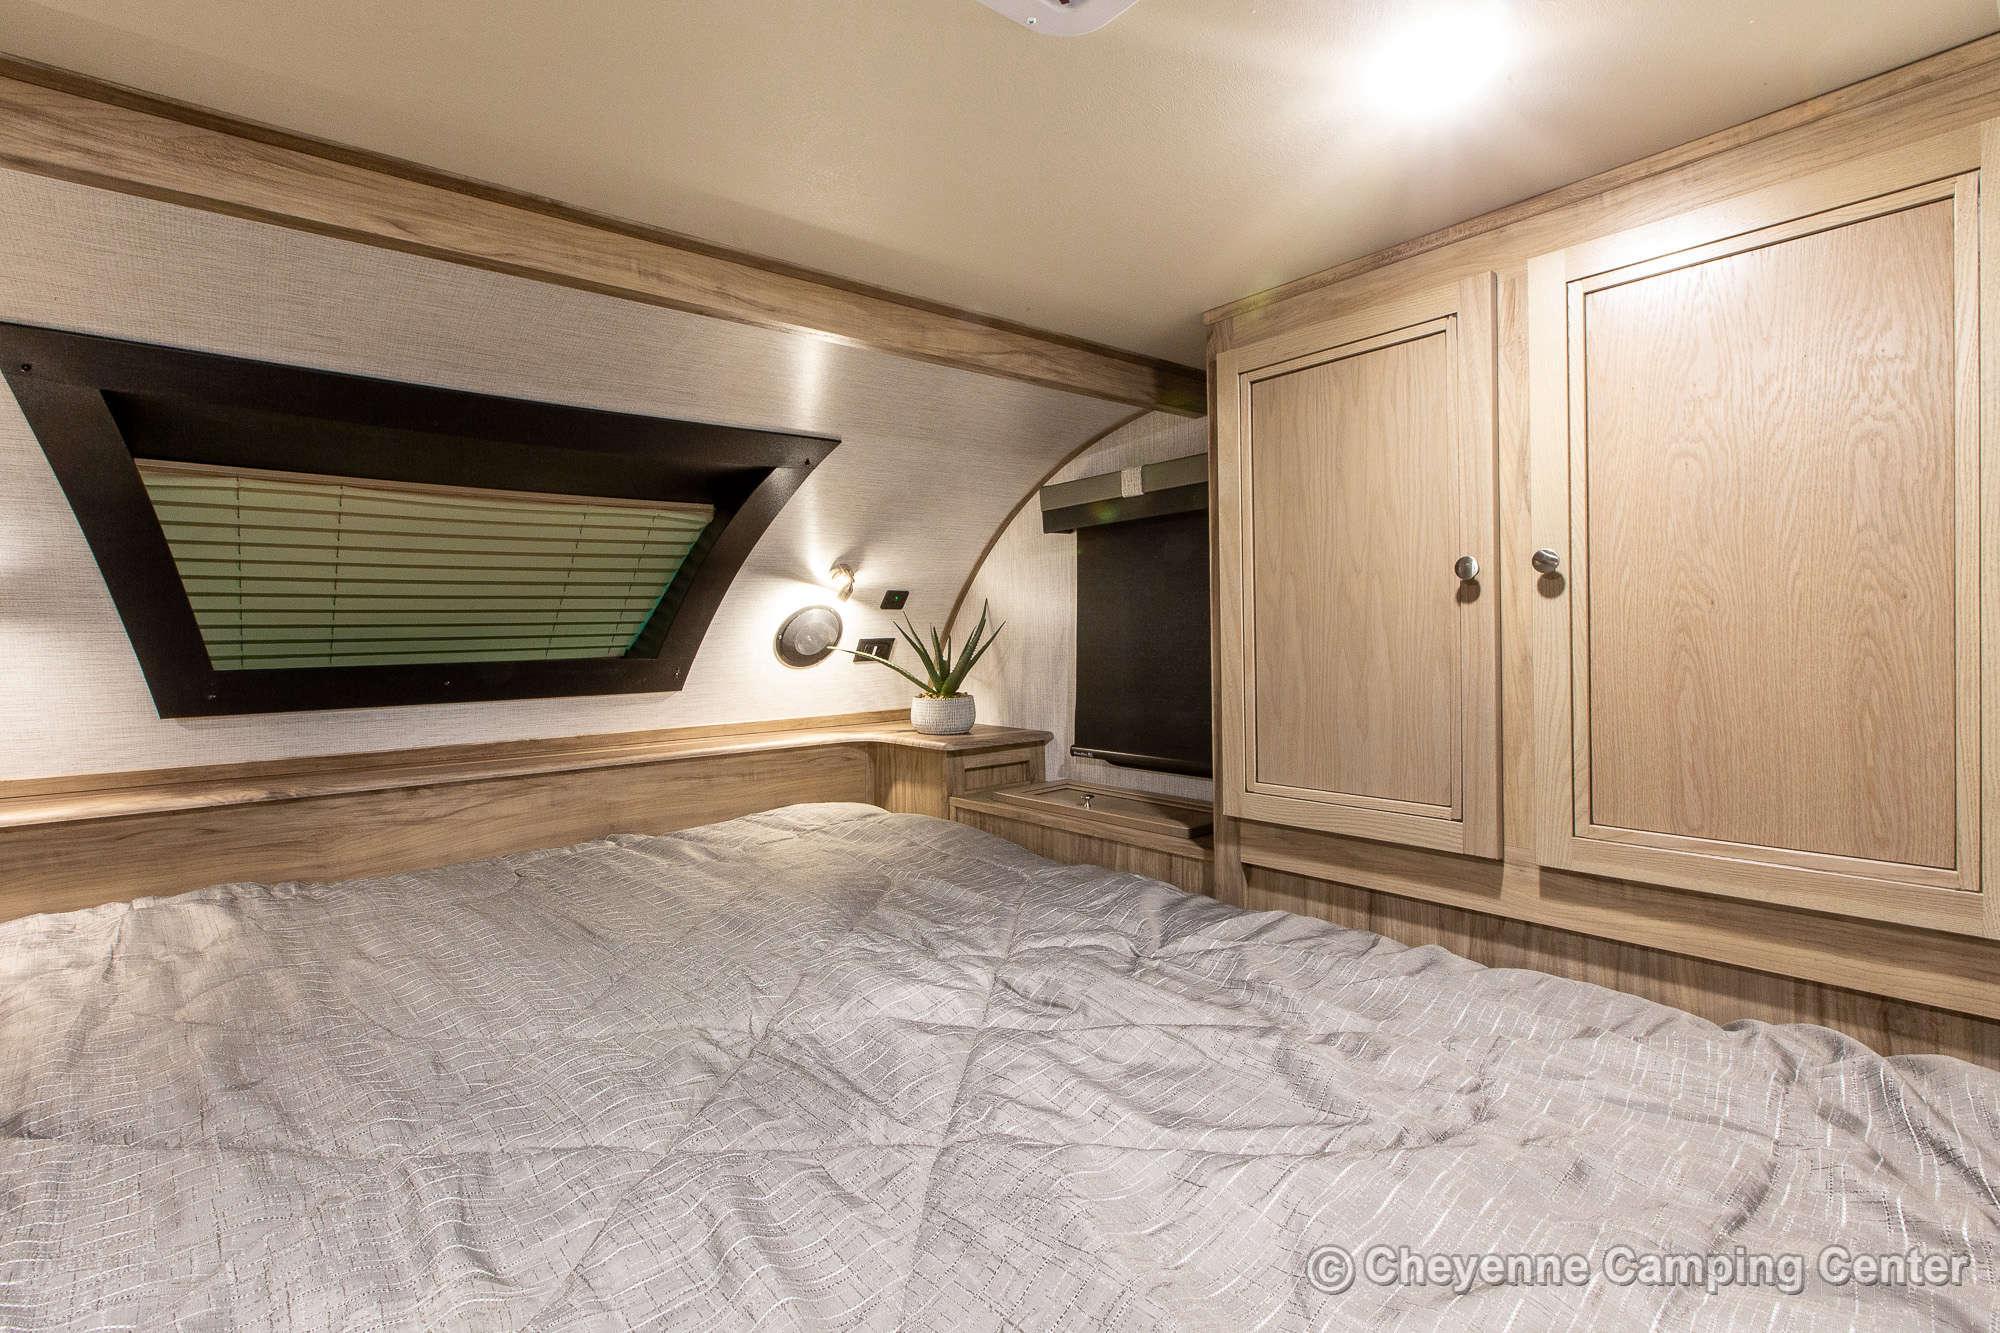 2021 Palomino BackPack HS-2910 Truck Camper Interior Image